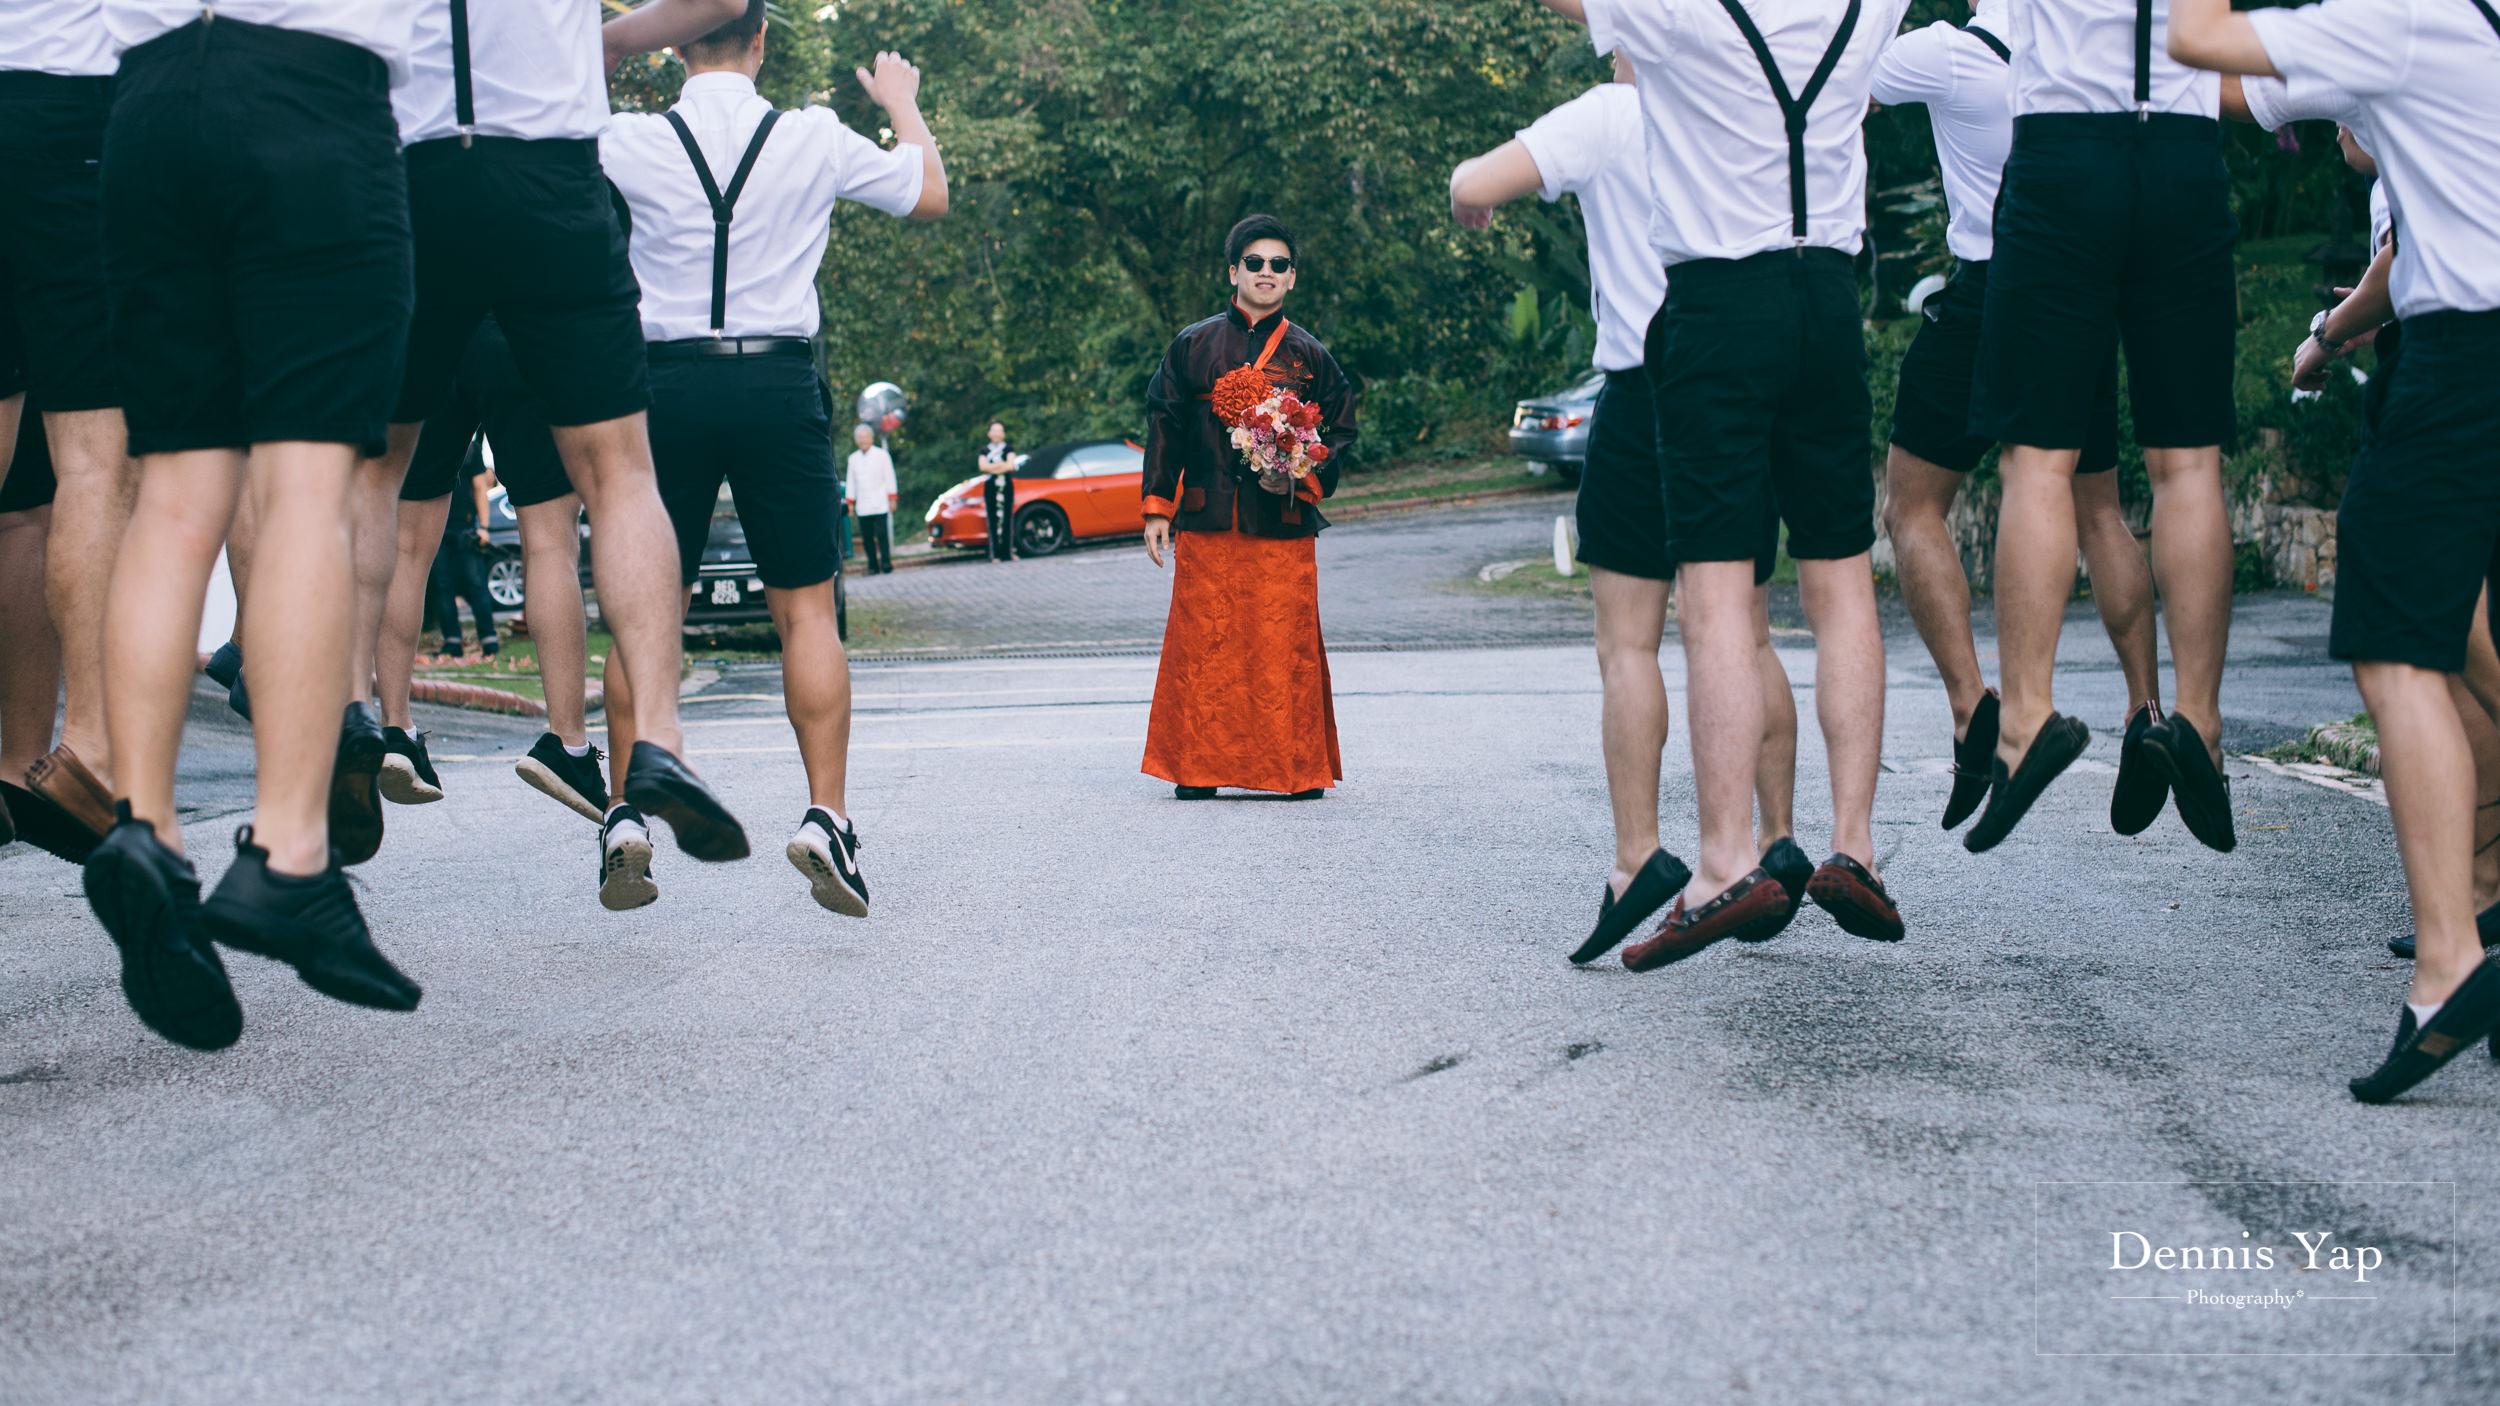 kuan rachel wedding day kuala lumpur melbourne gate crash dennis yap malaysia wedding photographer-2.jpg